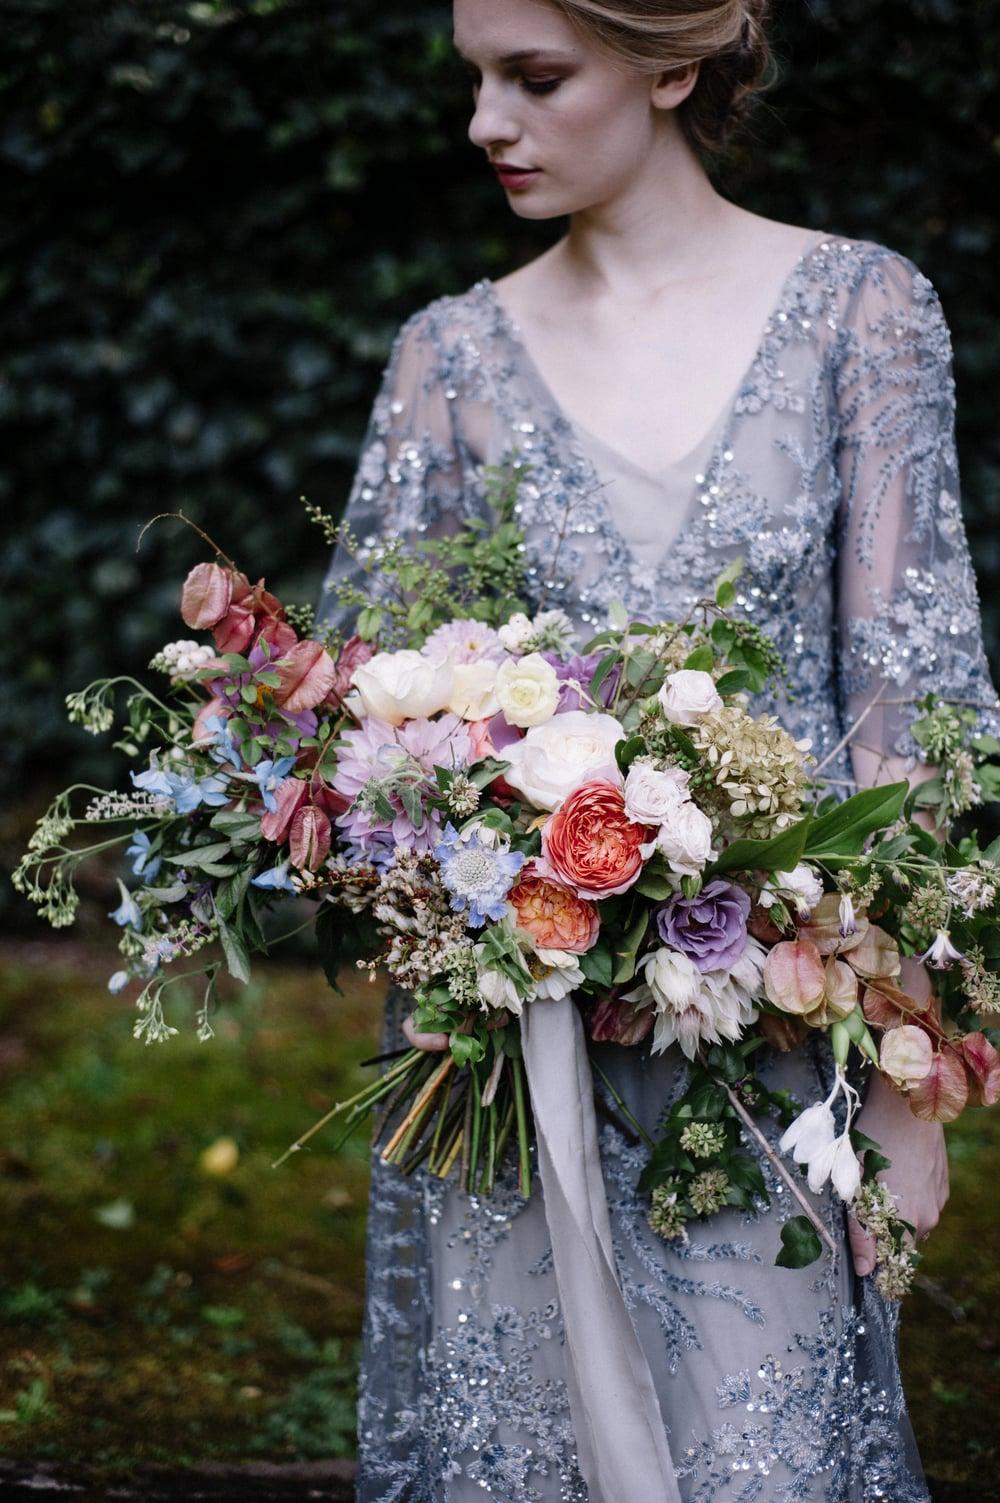 amy-osaba-events-flower-workshop-katie-hyatt-blue-dress-pink-flowers-bouquet55.jpg